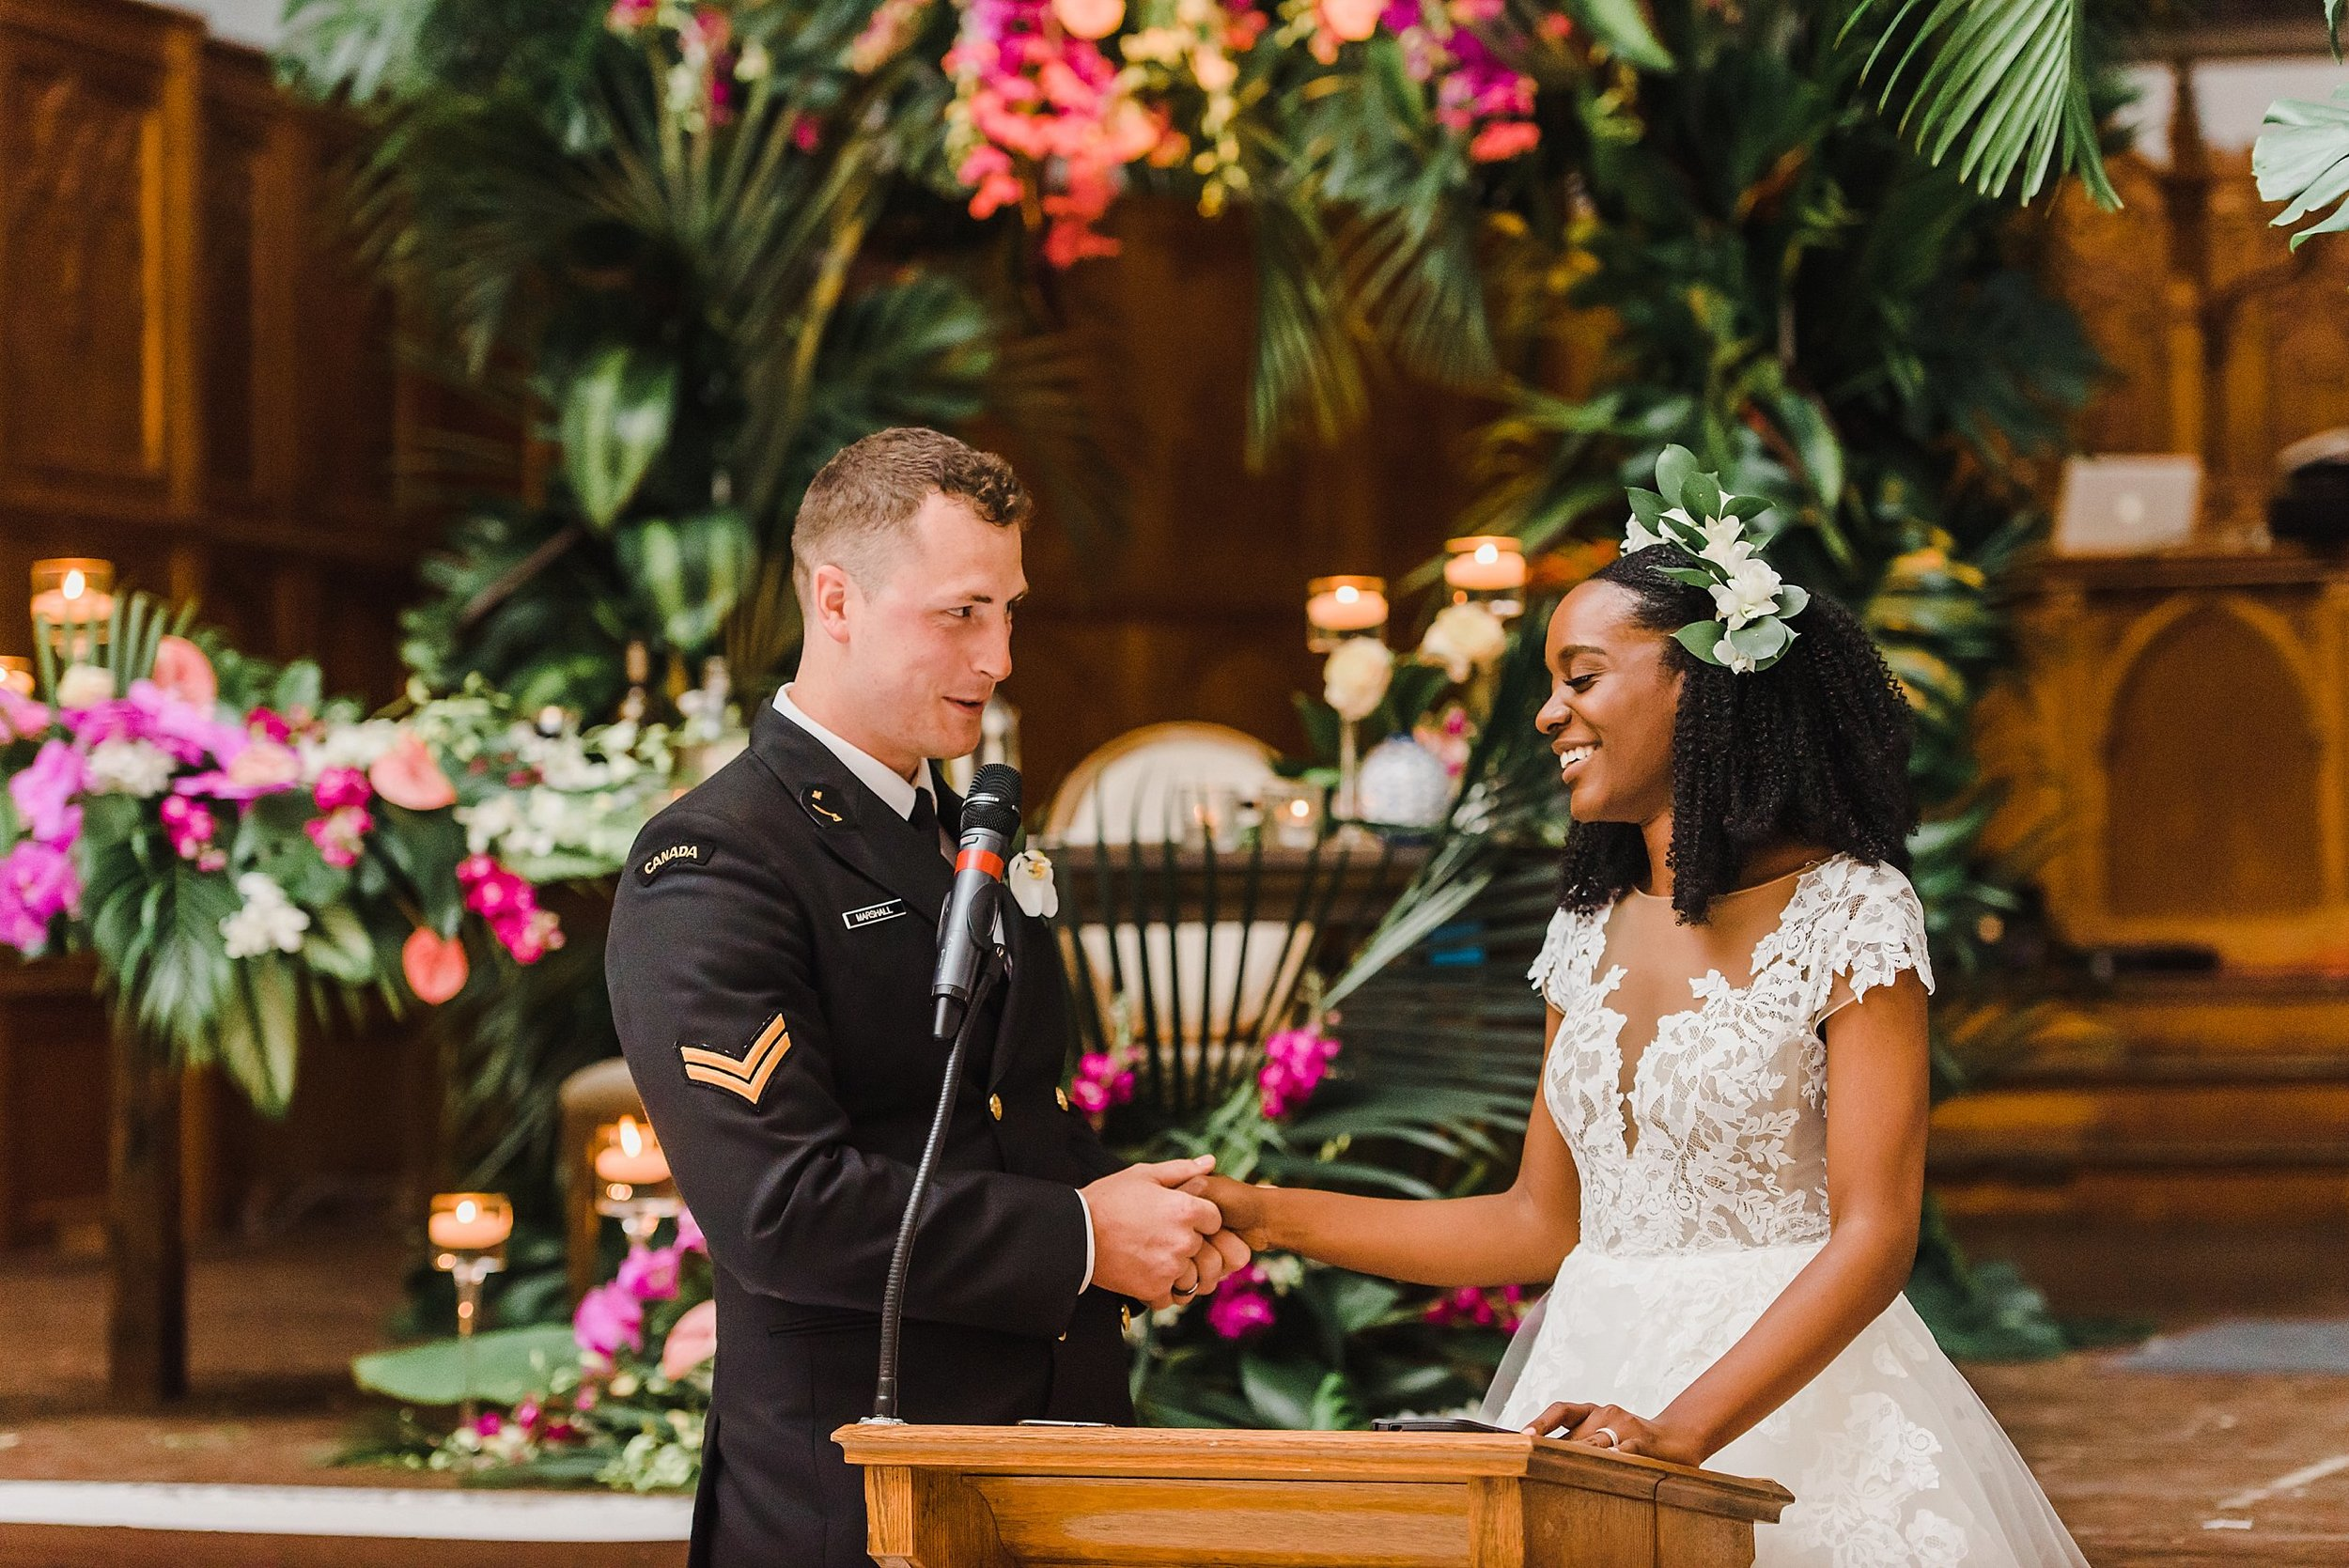 light airy indie fine art ottawa wedding photographer | Ali and Batoul Photography_1050.jpg